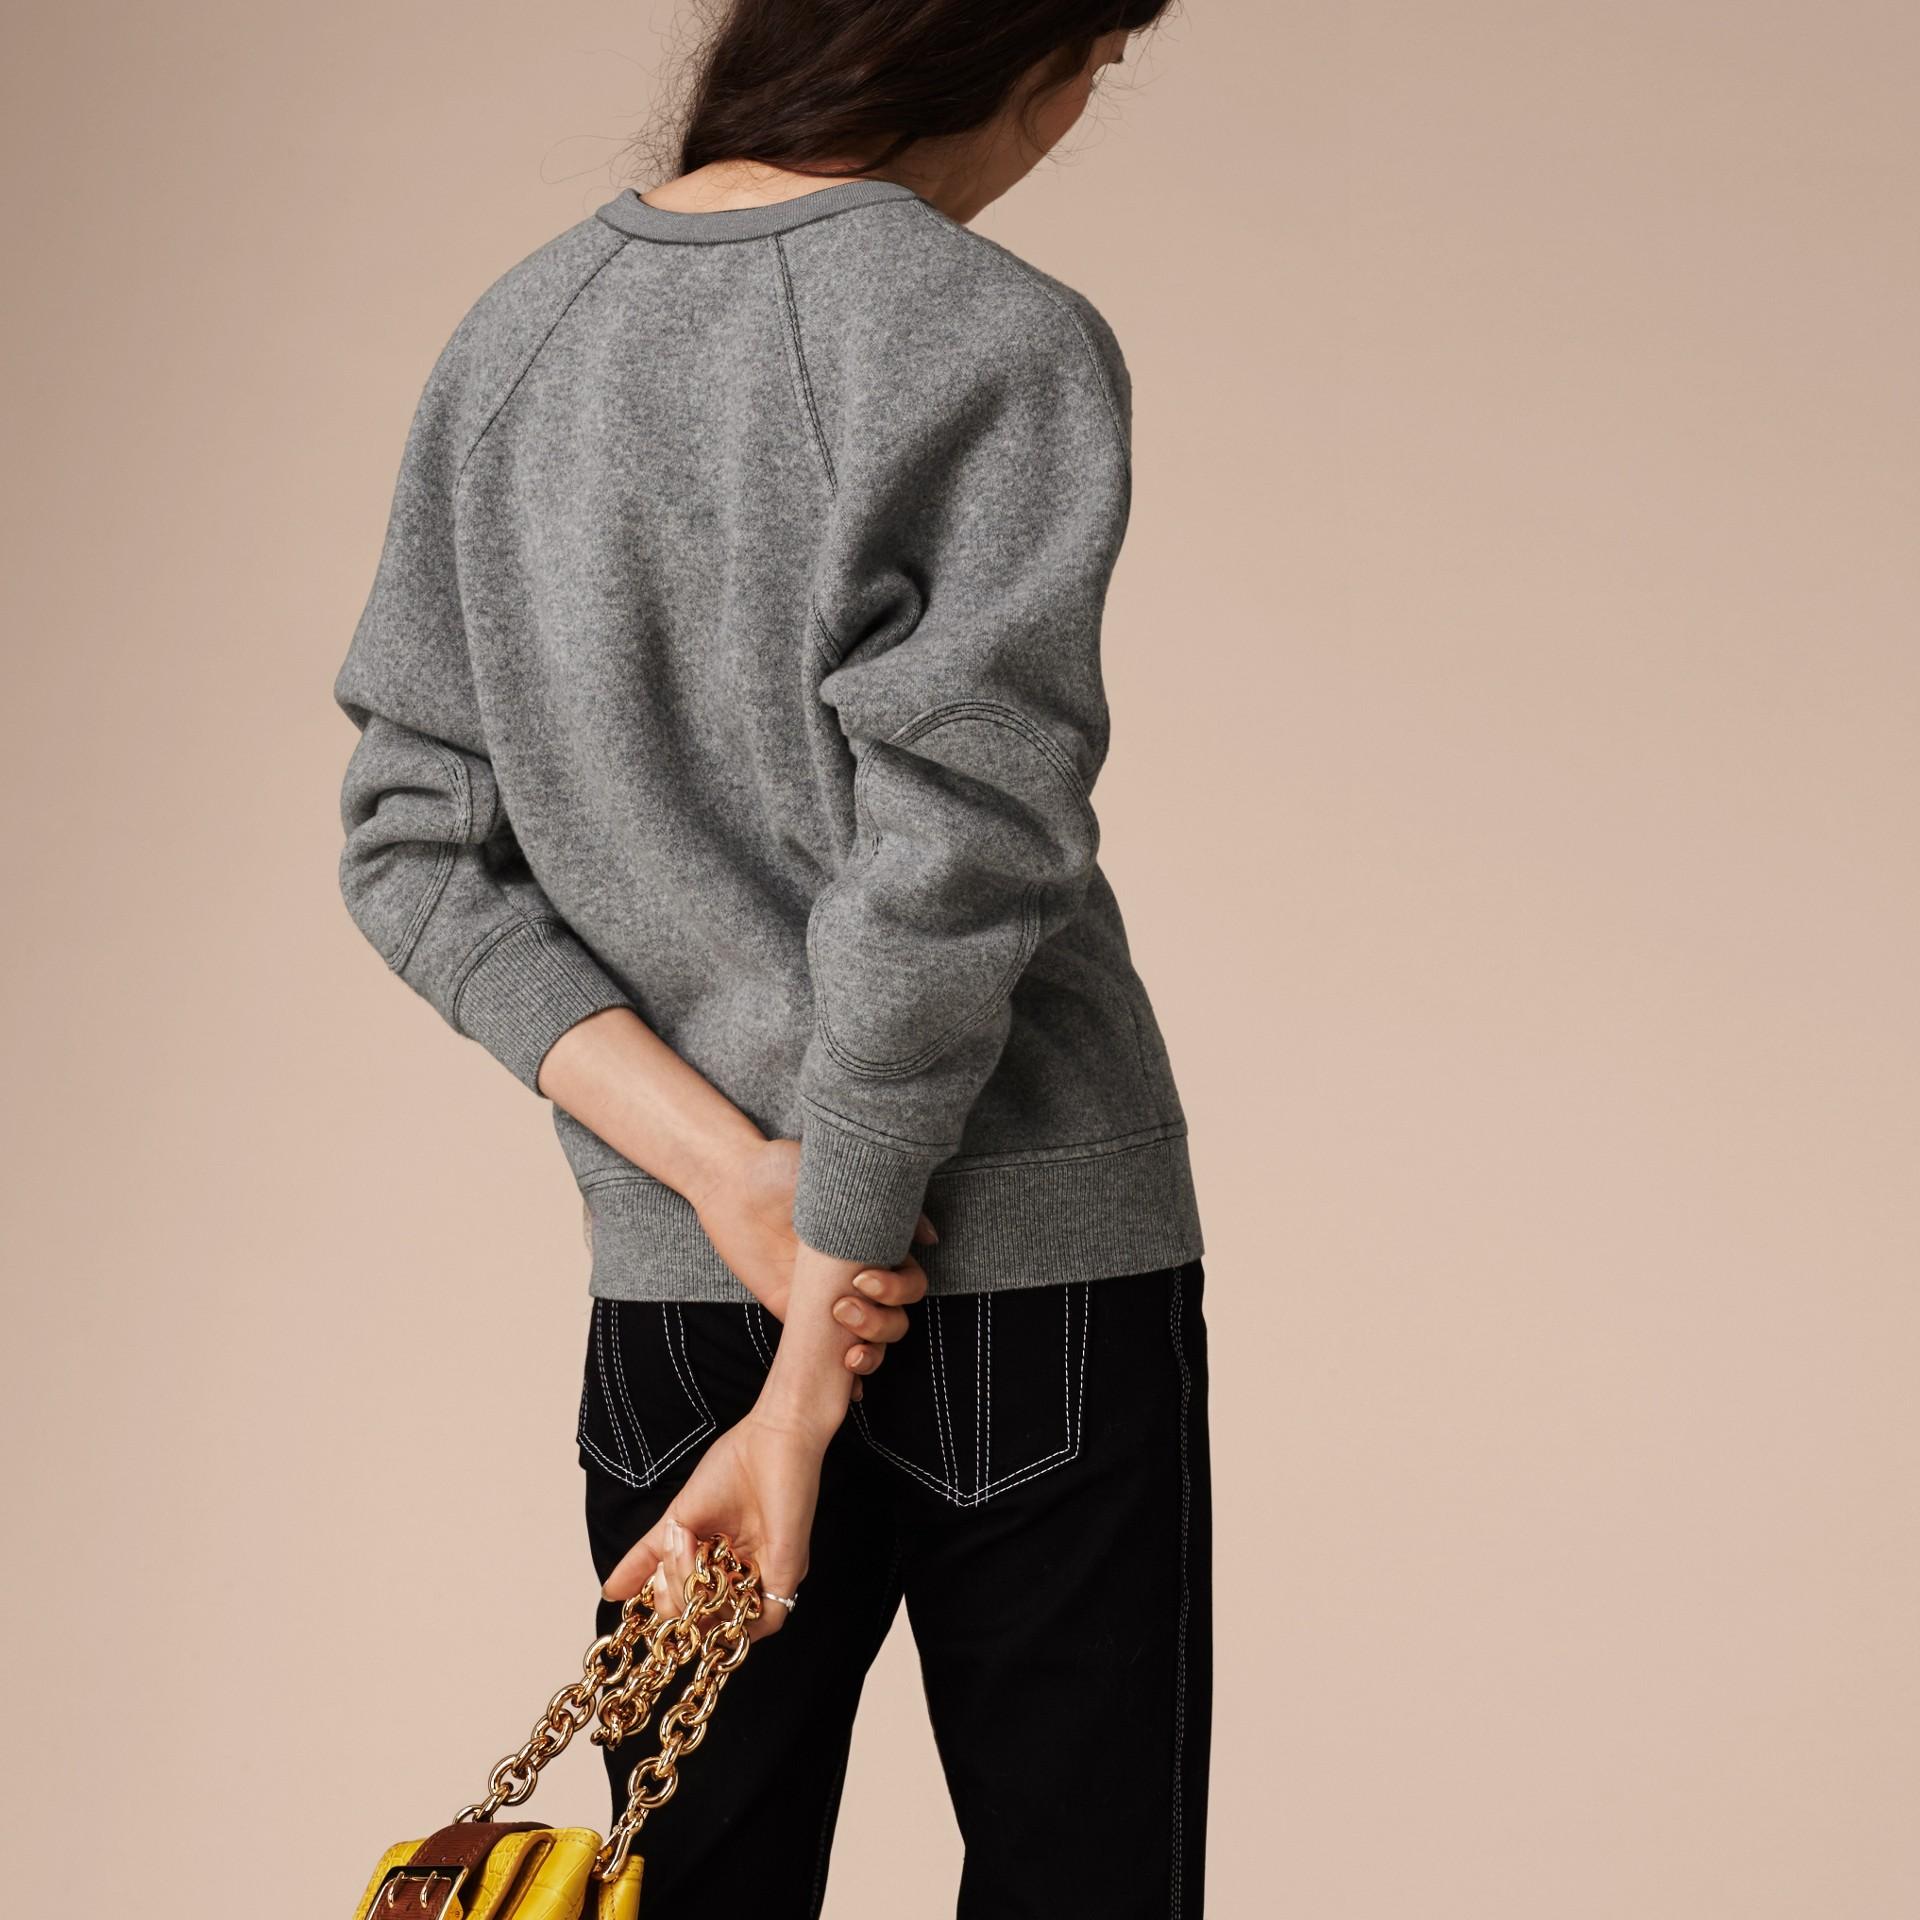 Grigio medio mélange/nero Pullover strutturato in lana e cashmere Grigio Medio Mélange/nero - immagine della galleria 4